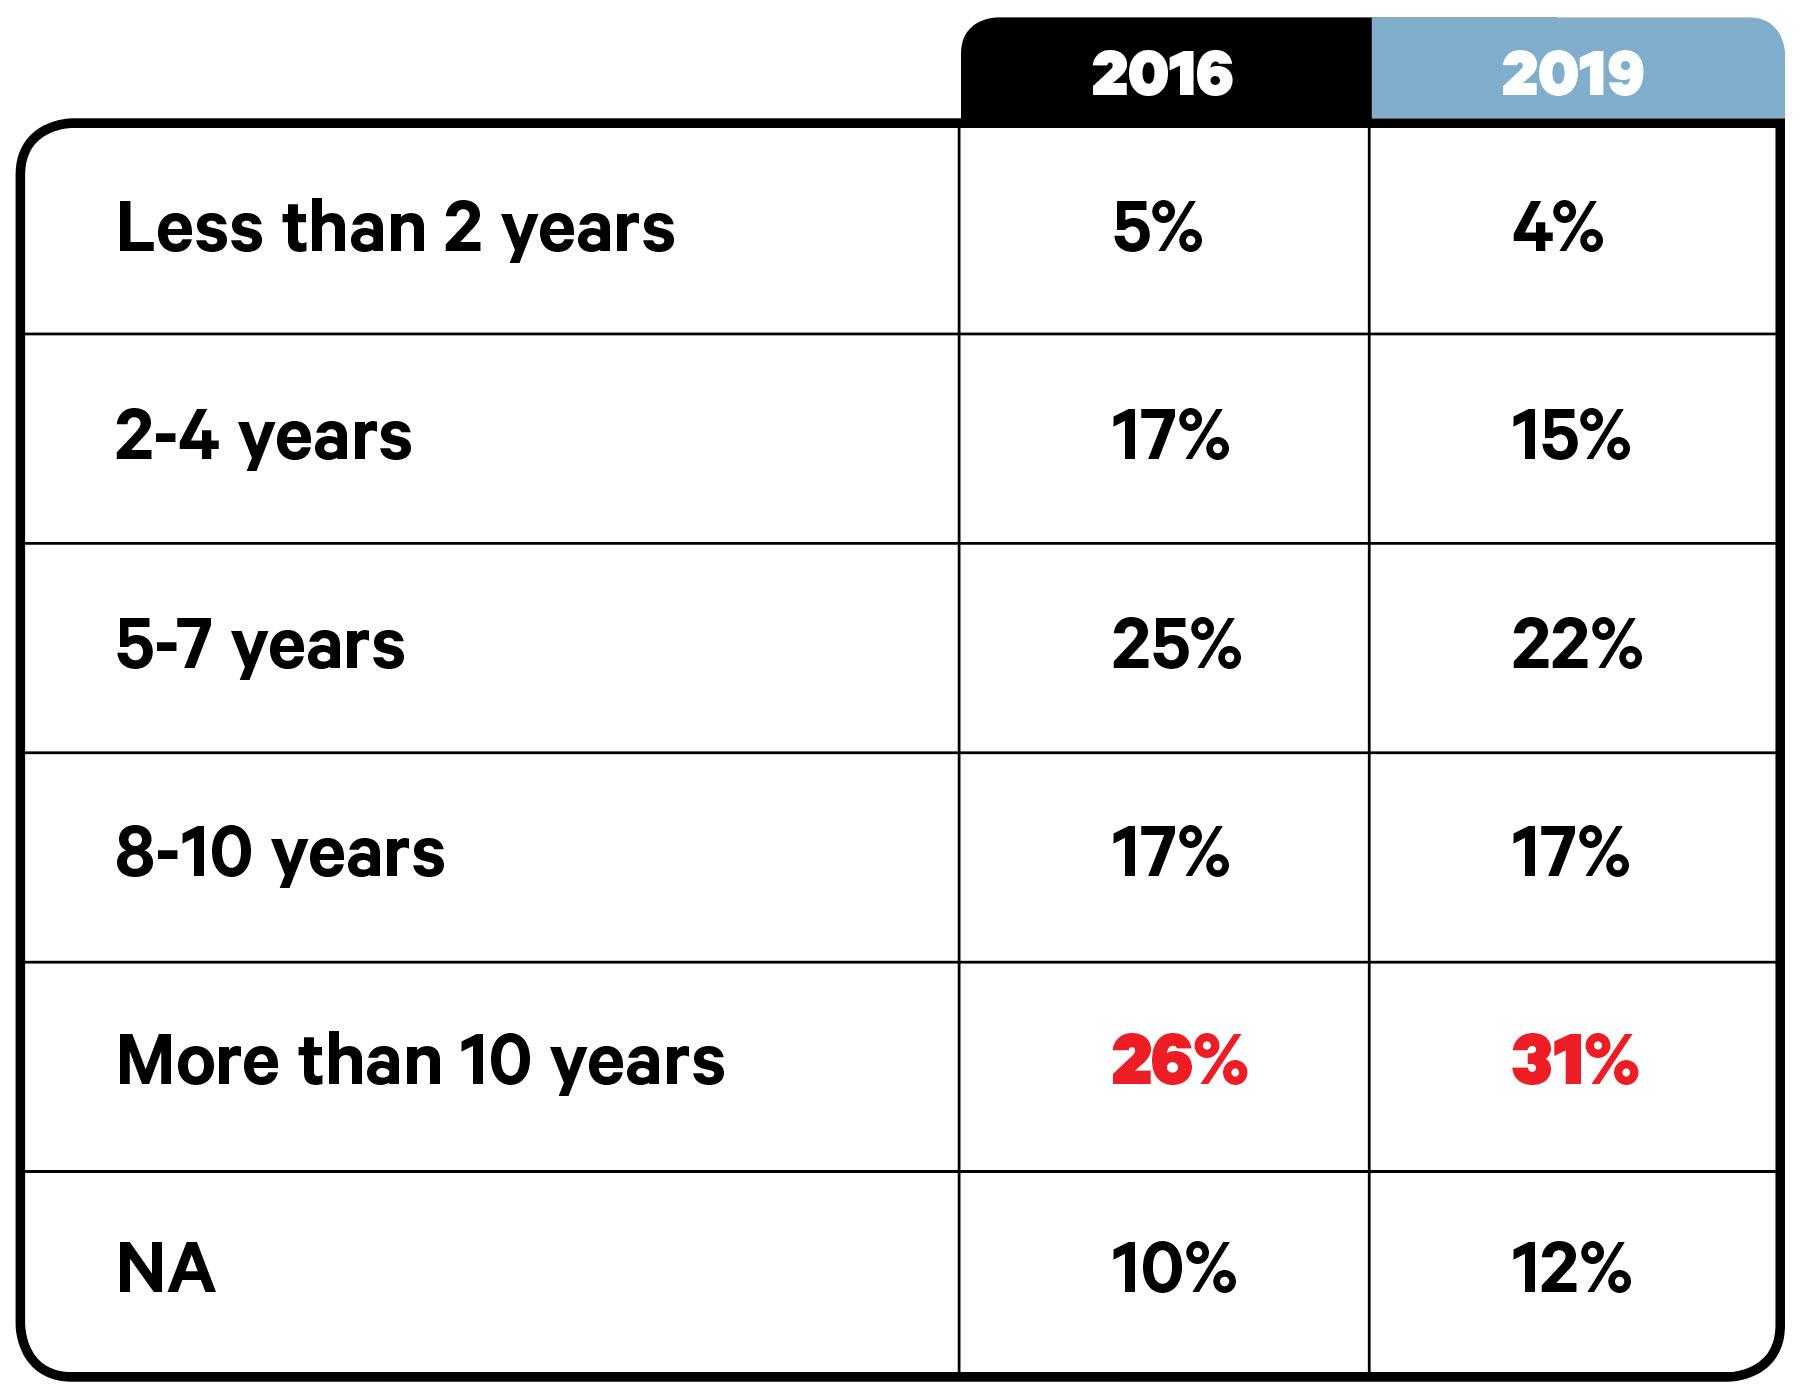 The Big Survey 2019: Management & Staff